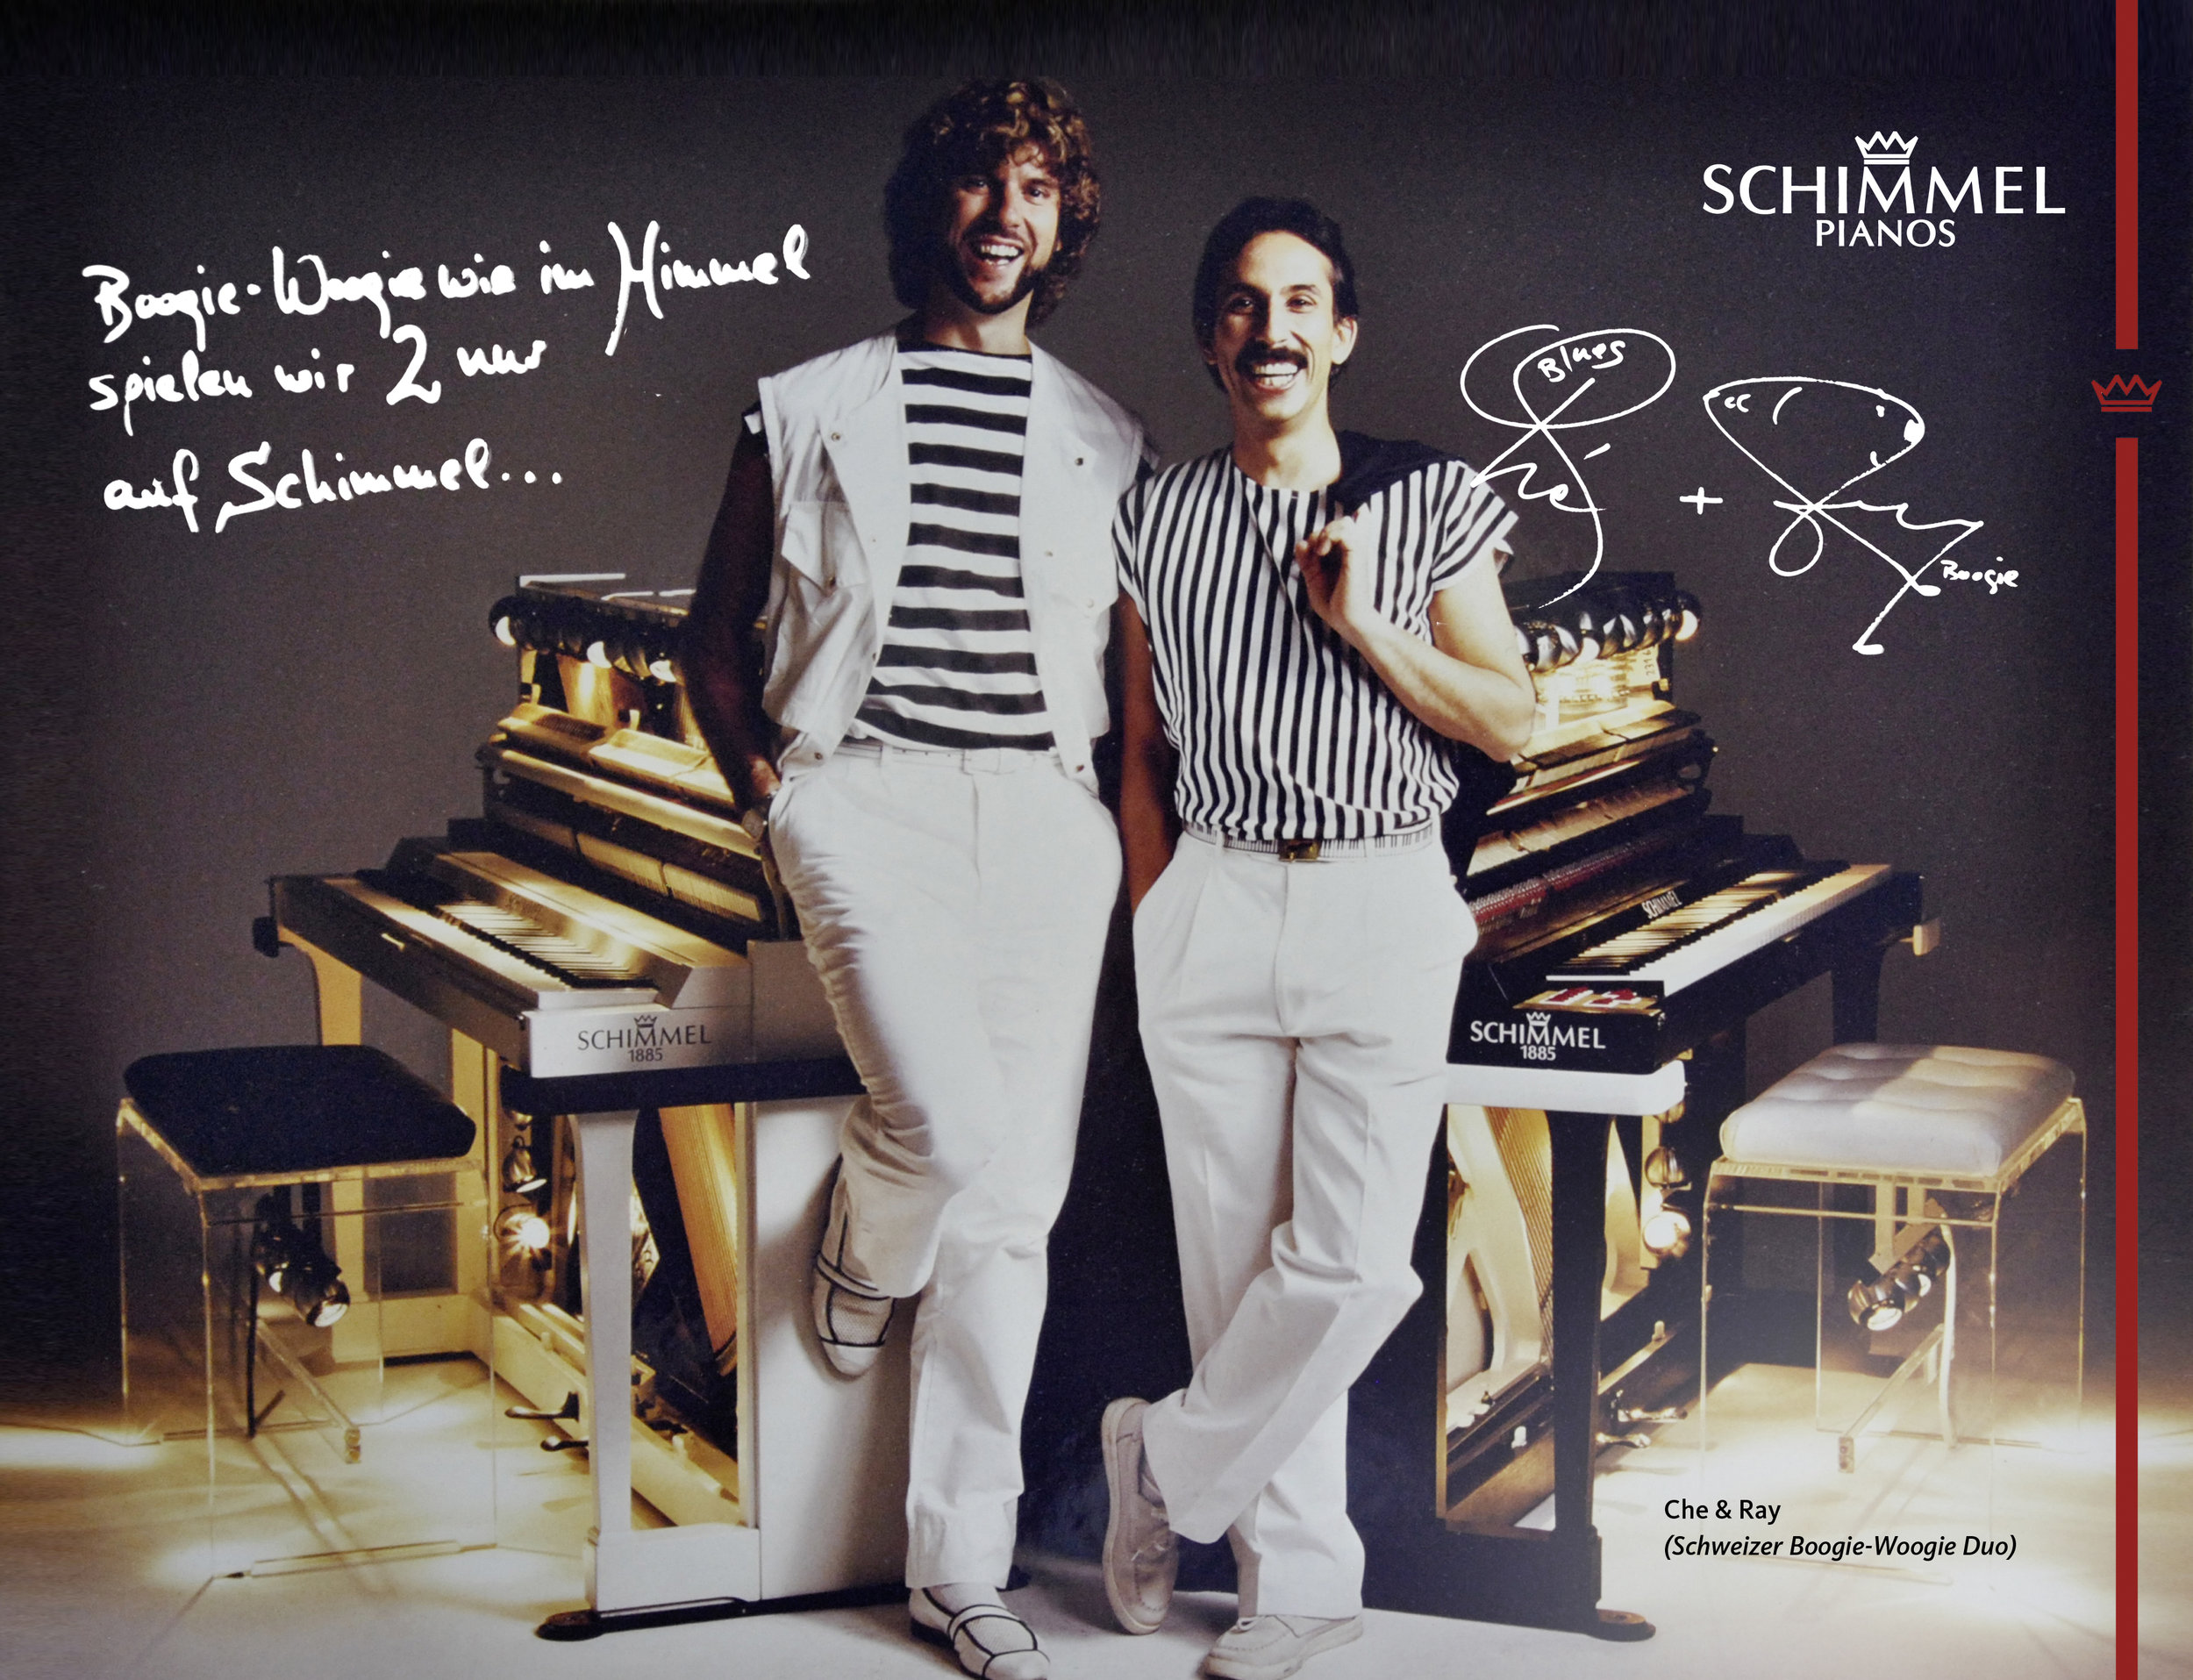 Che & Ray Schimmel Pianos